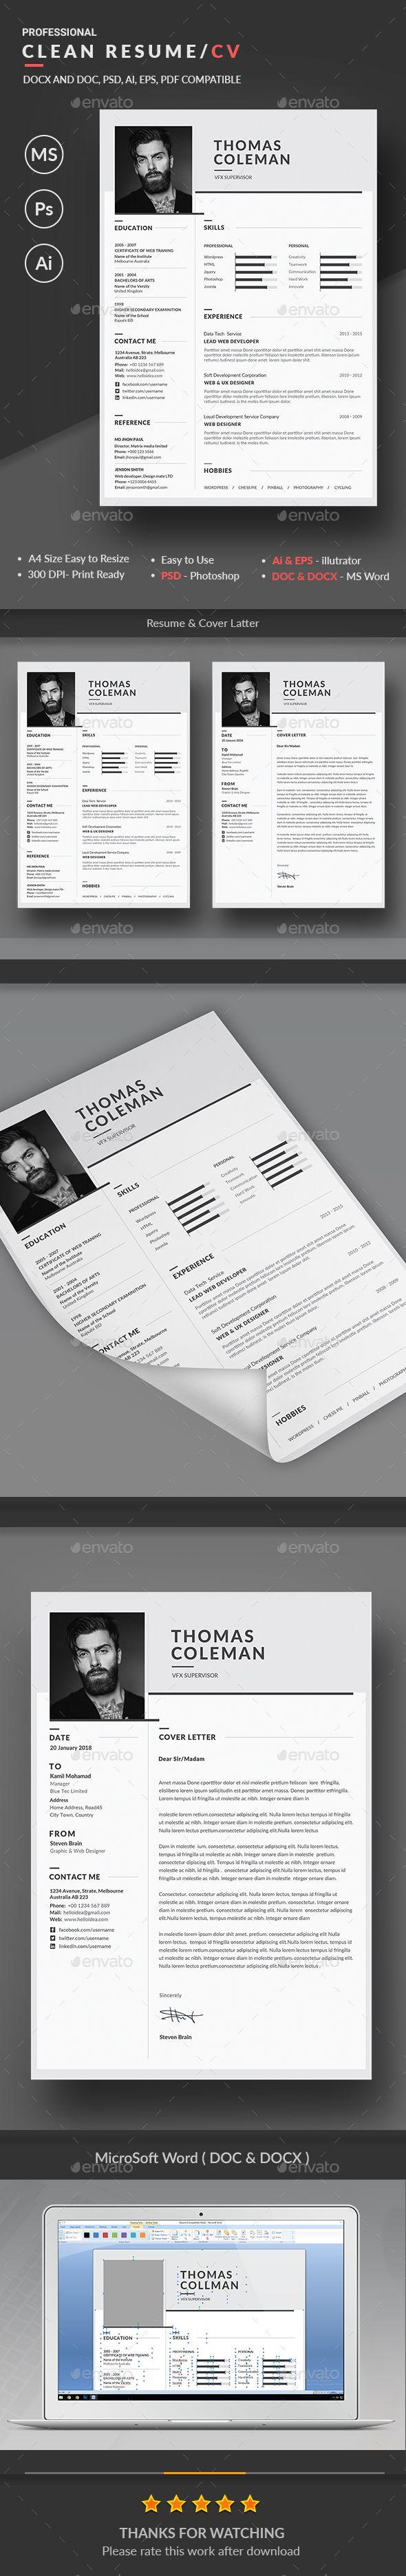 Best 100+ CV\'s van nu images on Pinterest | Resume design, Creative ...